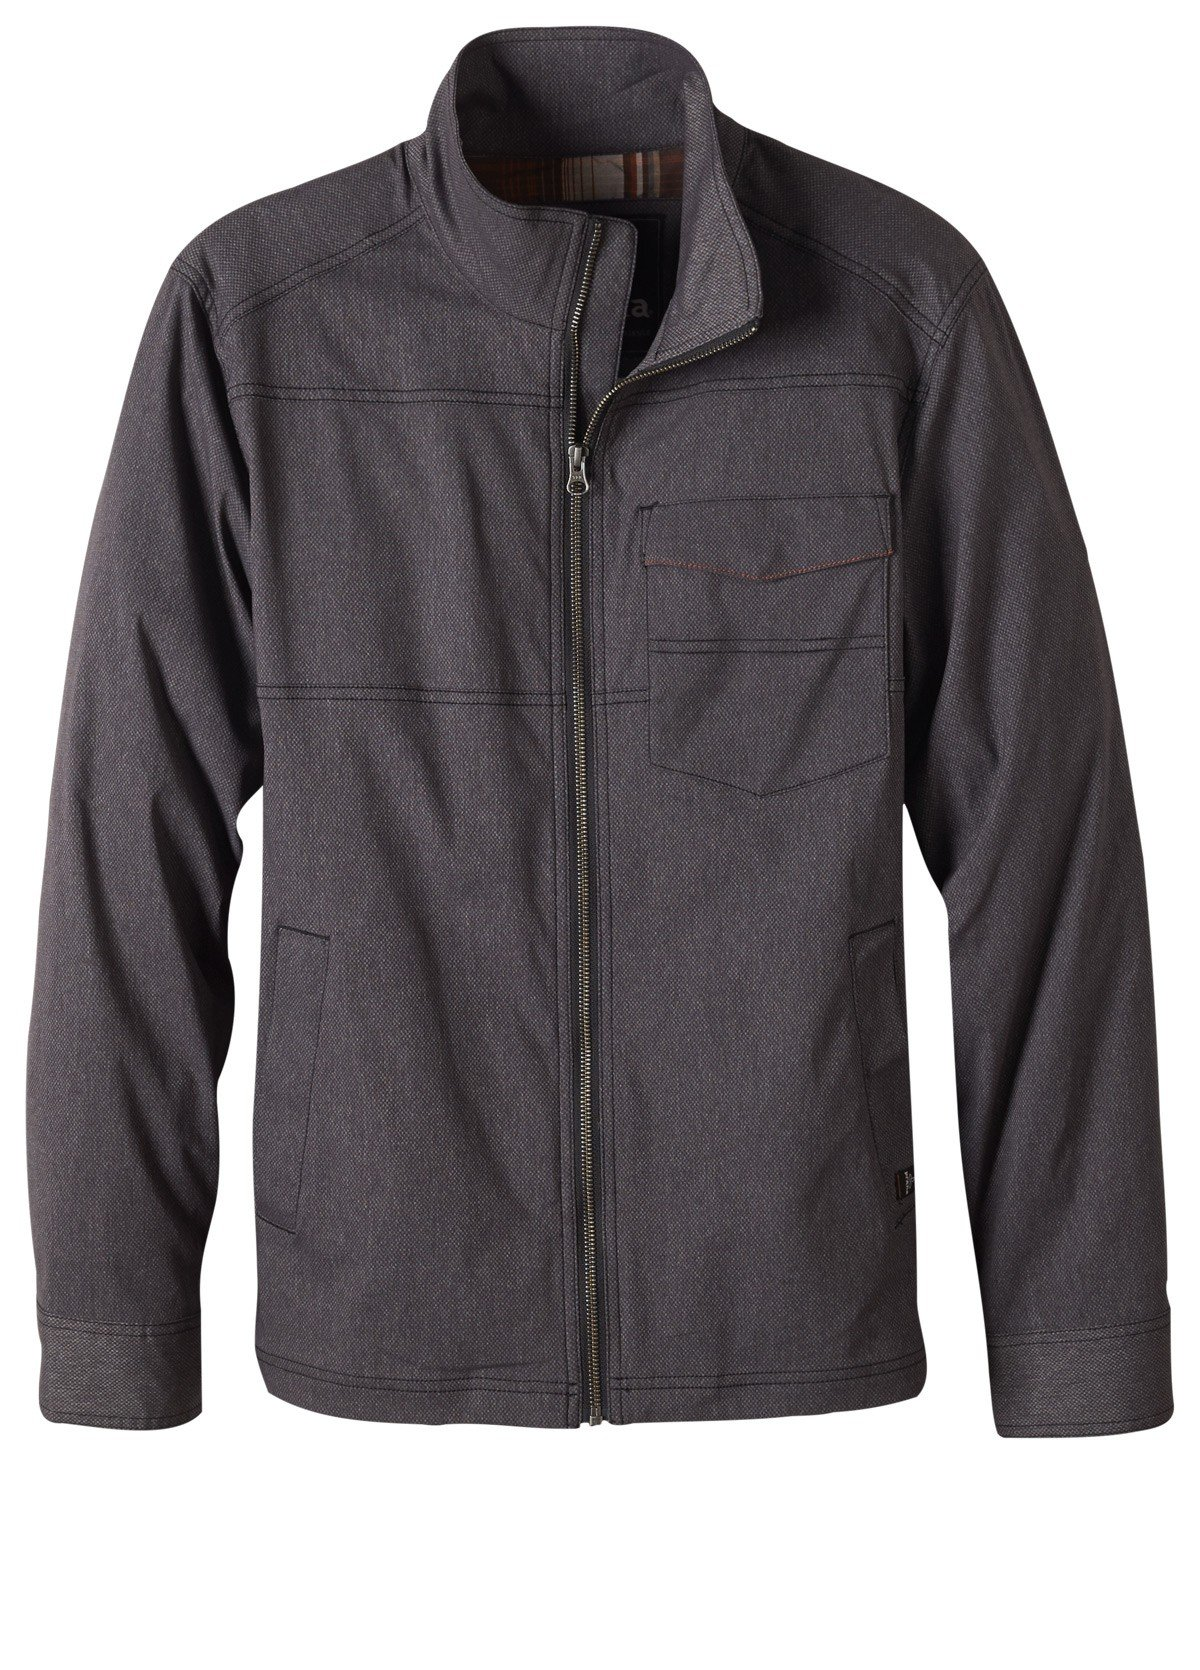 prAna Men's Zion Jacket Charcoal L & HDO Sport Travel Sunscreen (15 SPF) Spray Bundle